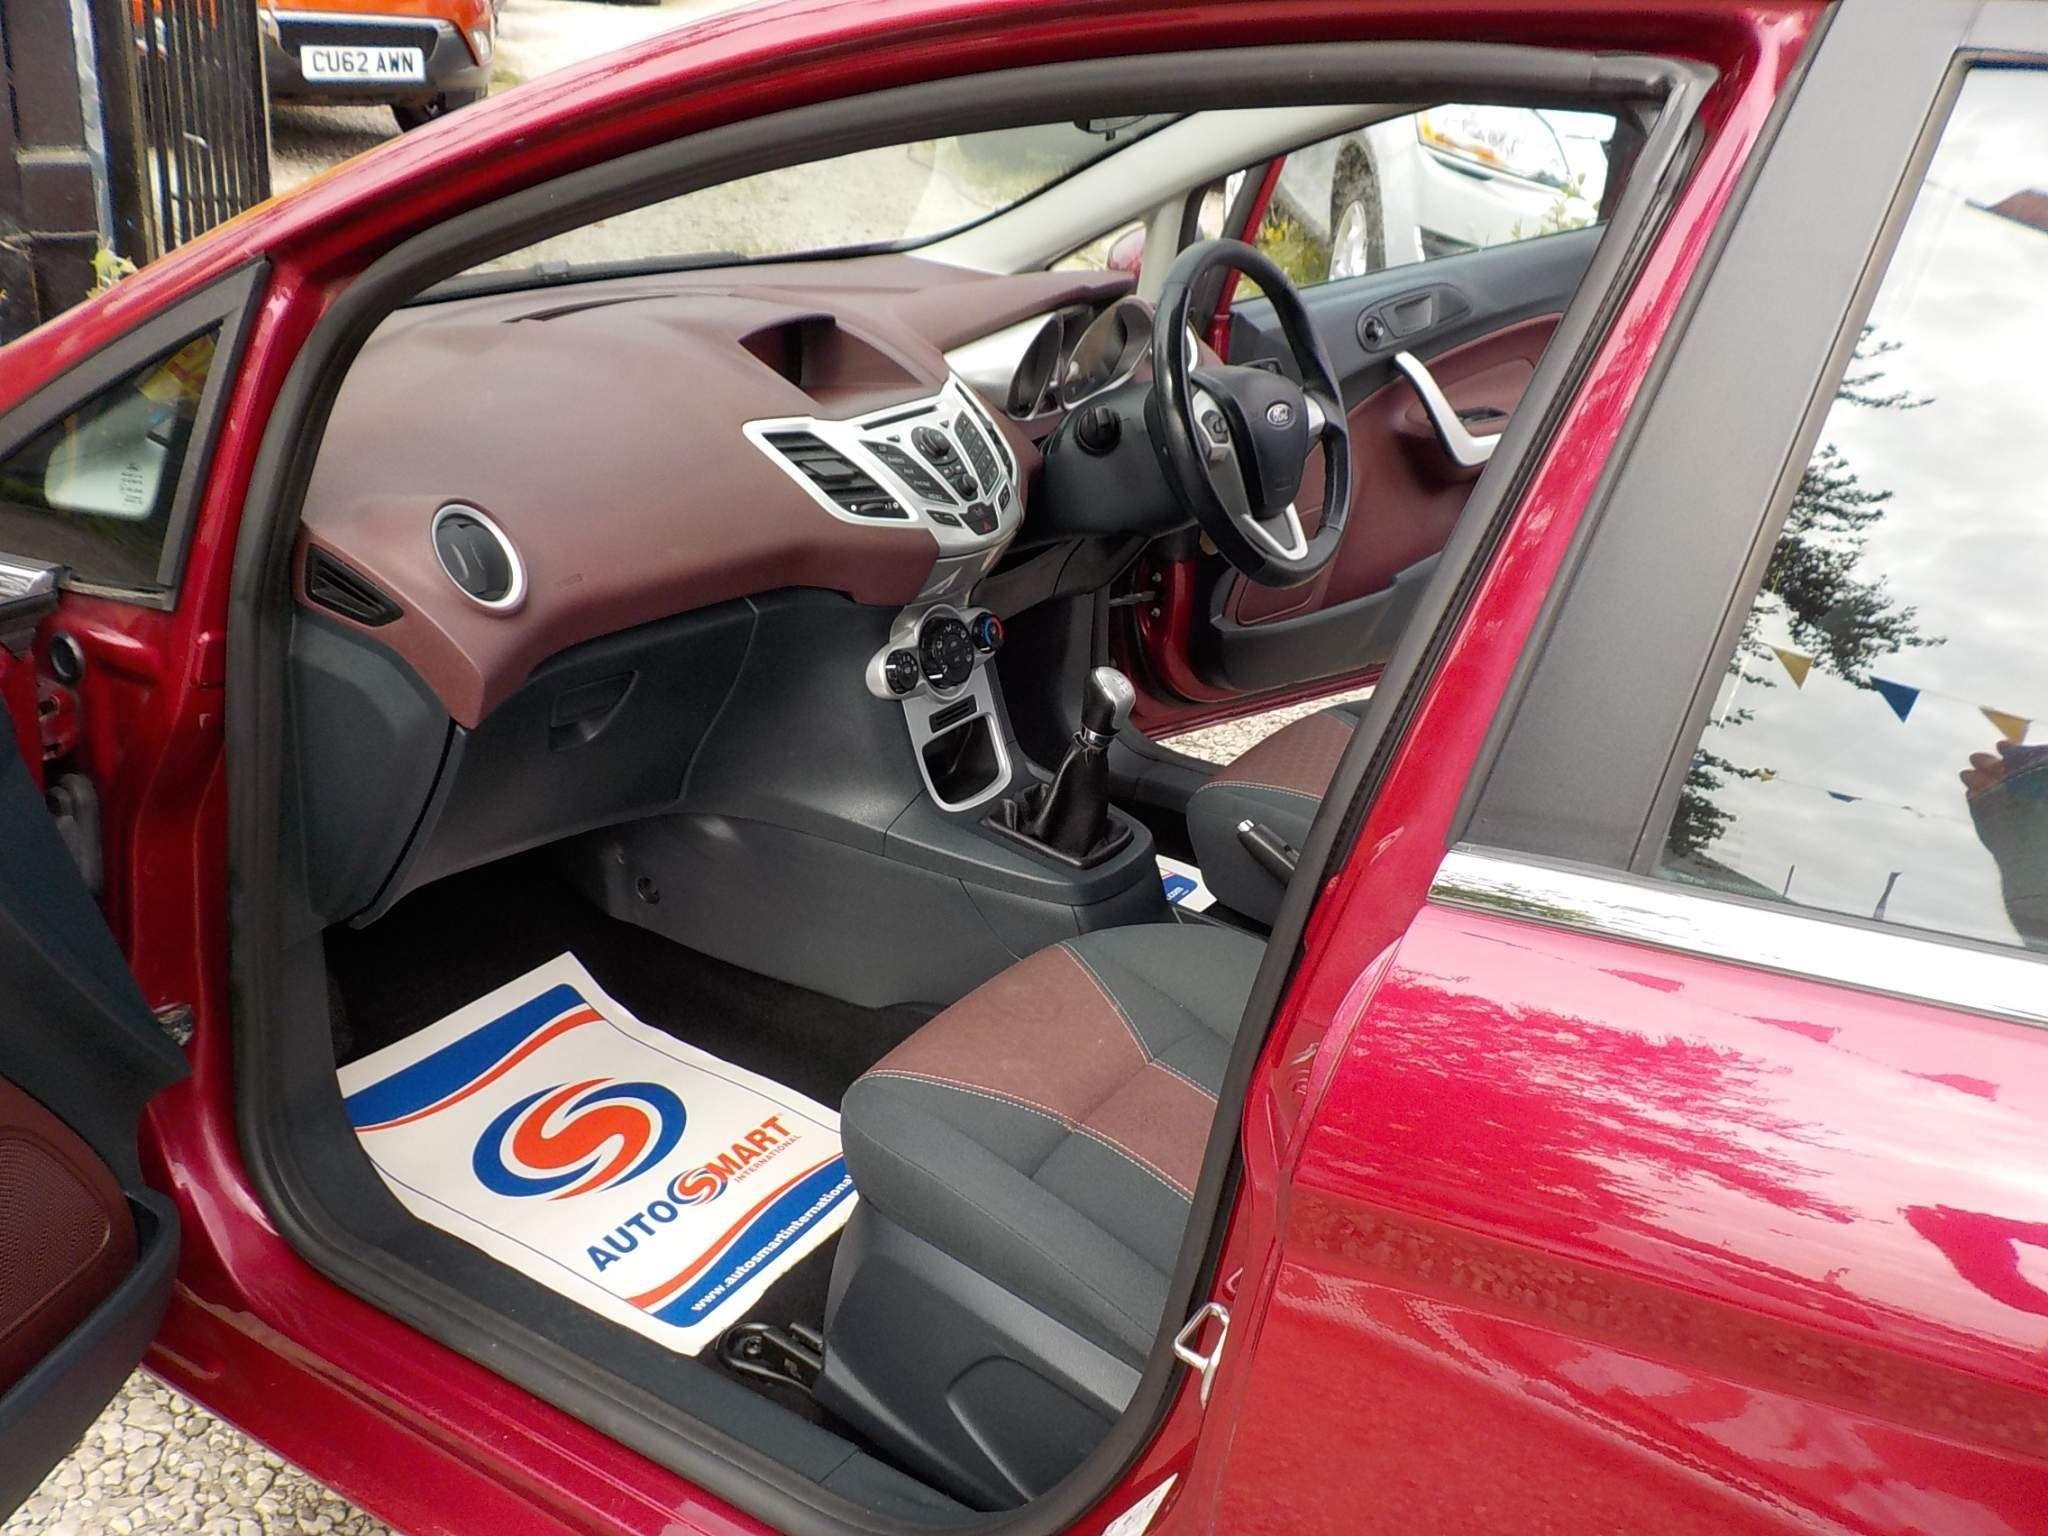 Ford Fiesta 1.4 TDCi Zetec 5dr